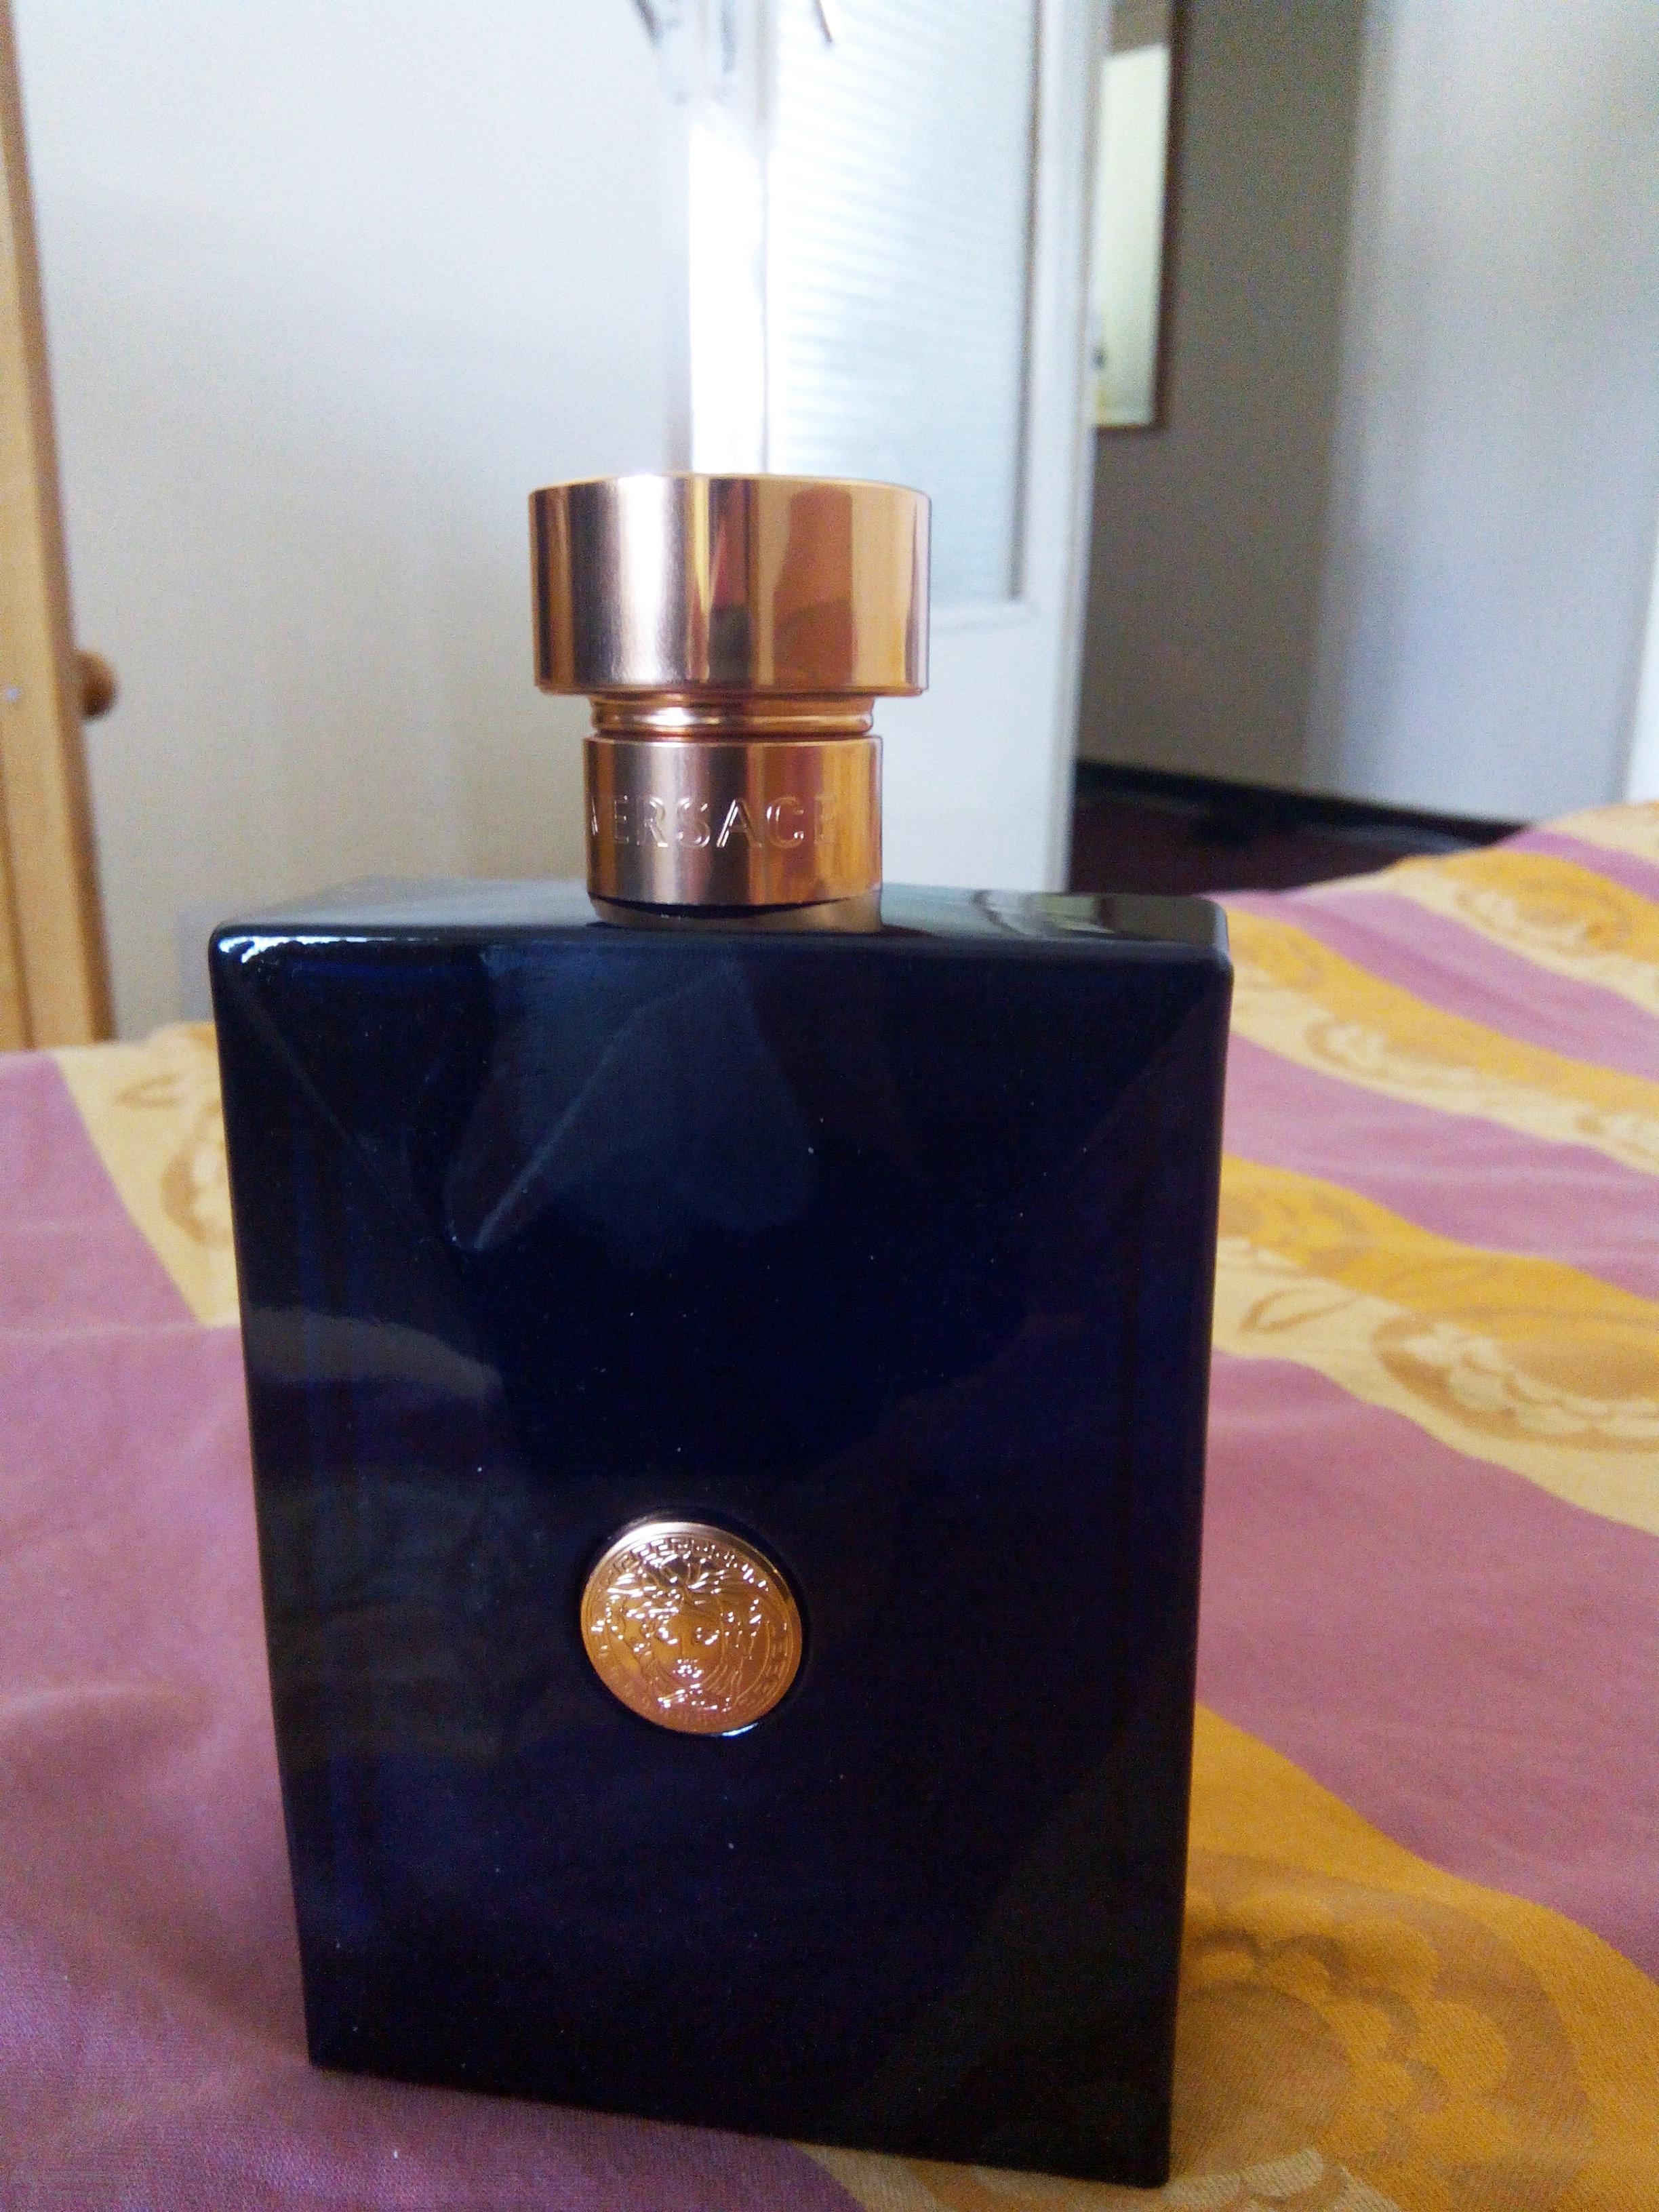 Ce Parfumparfumuri Aveti Si Ce Ati Vrea Sa Aveti Pagina 78